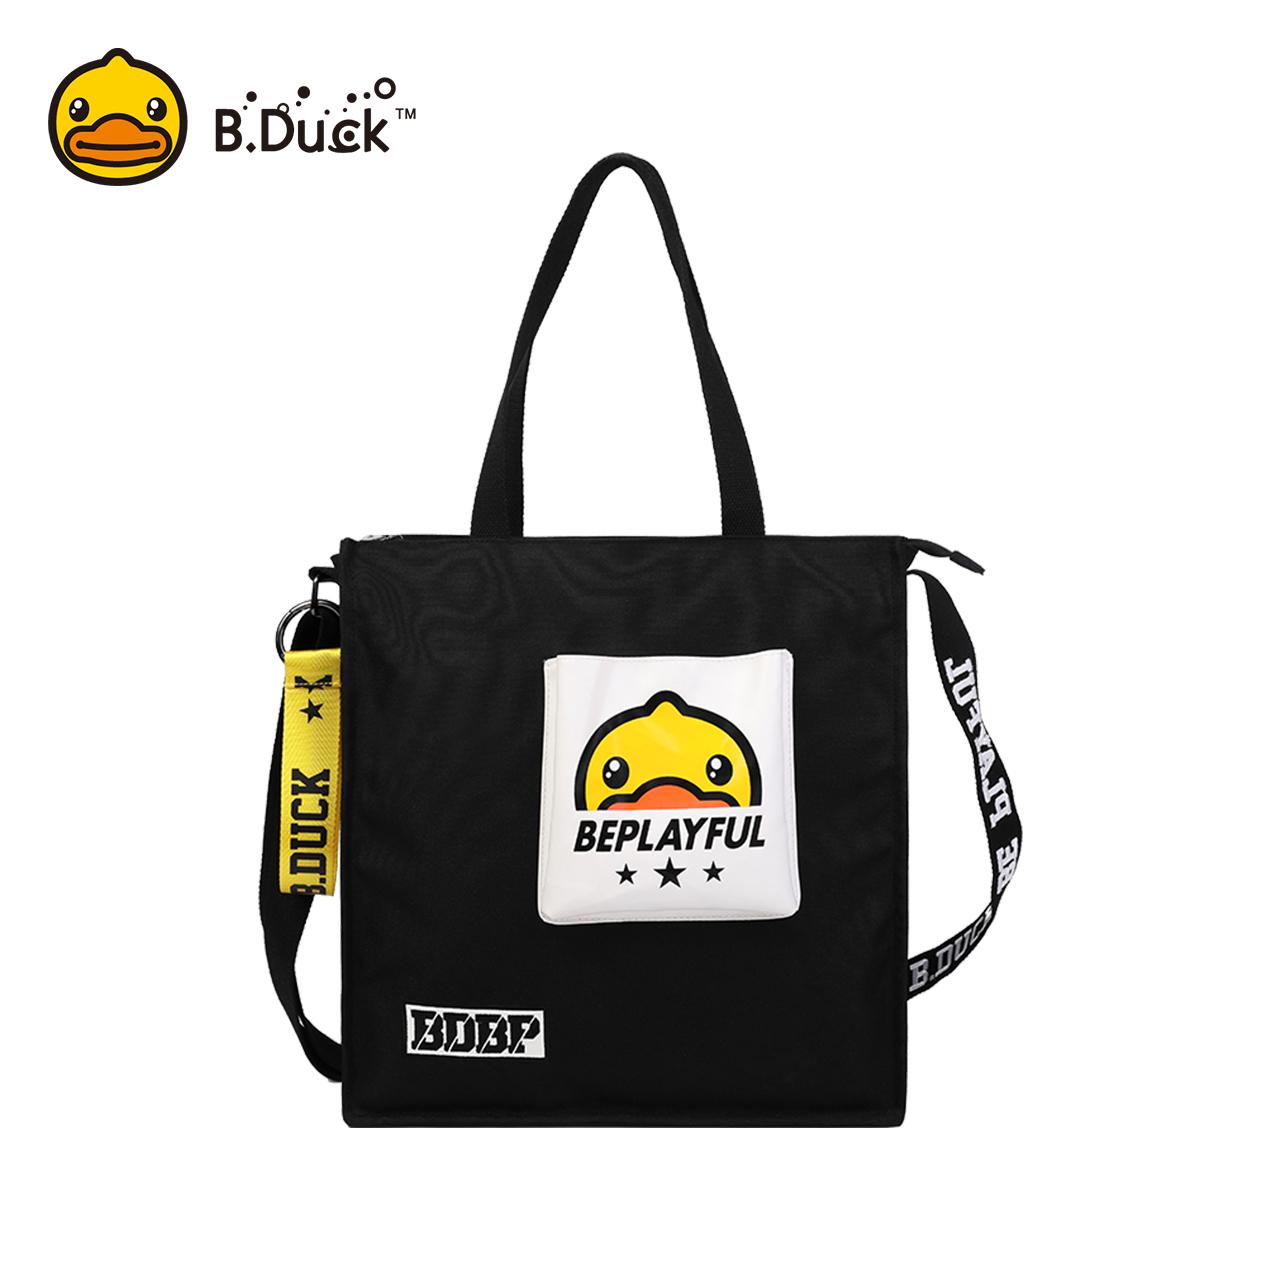 B.Duck小黄鸭ICONIC系列尼龙布单肩包时尚潮流卡通包2018新品